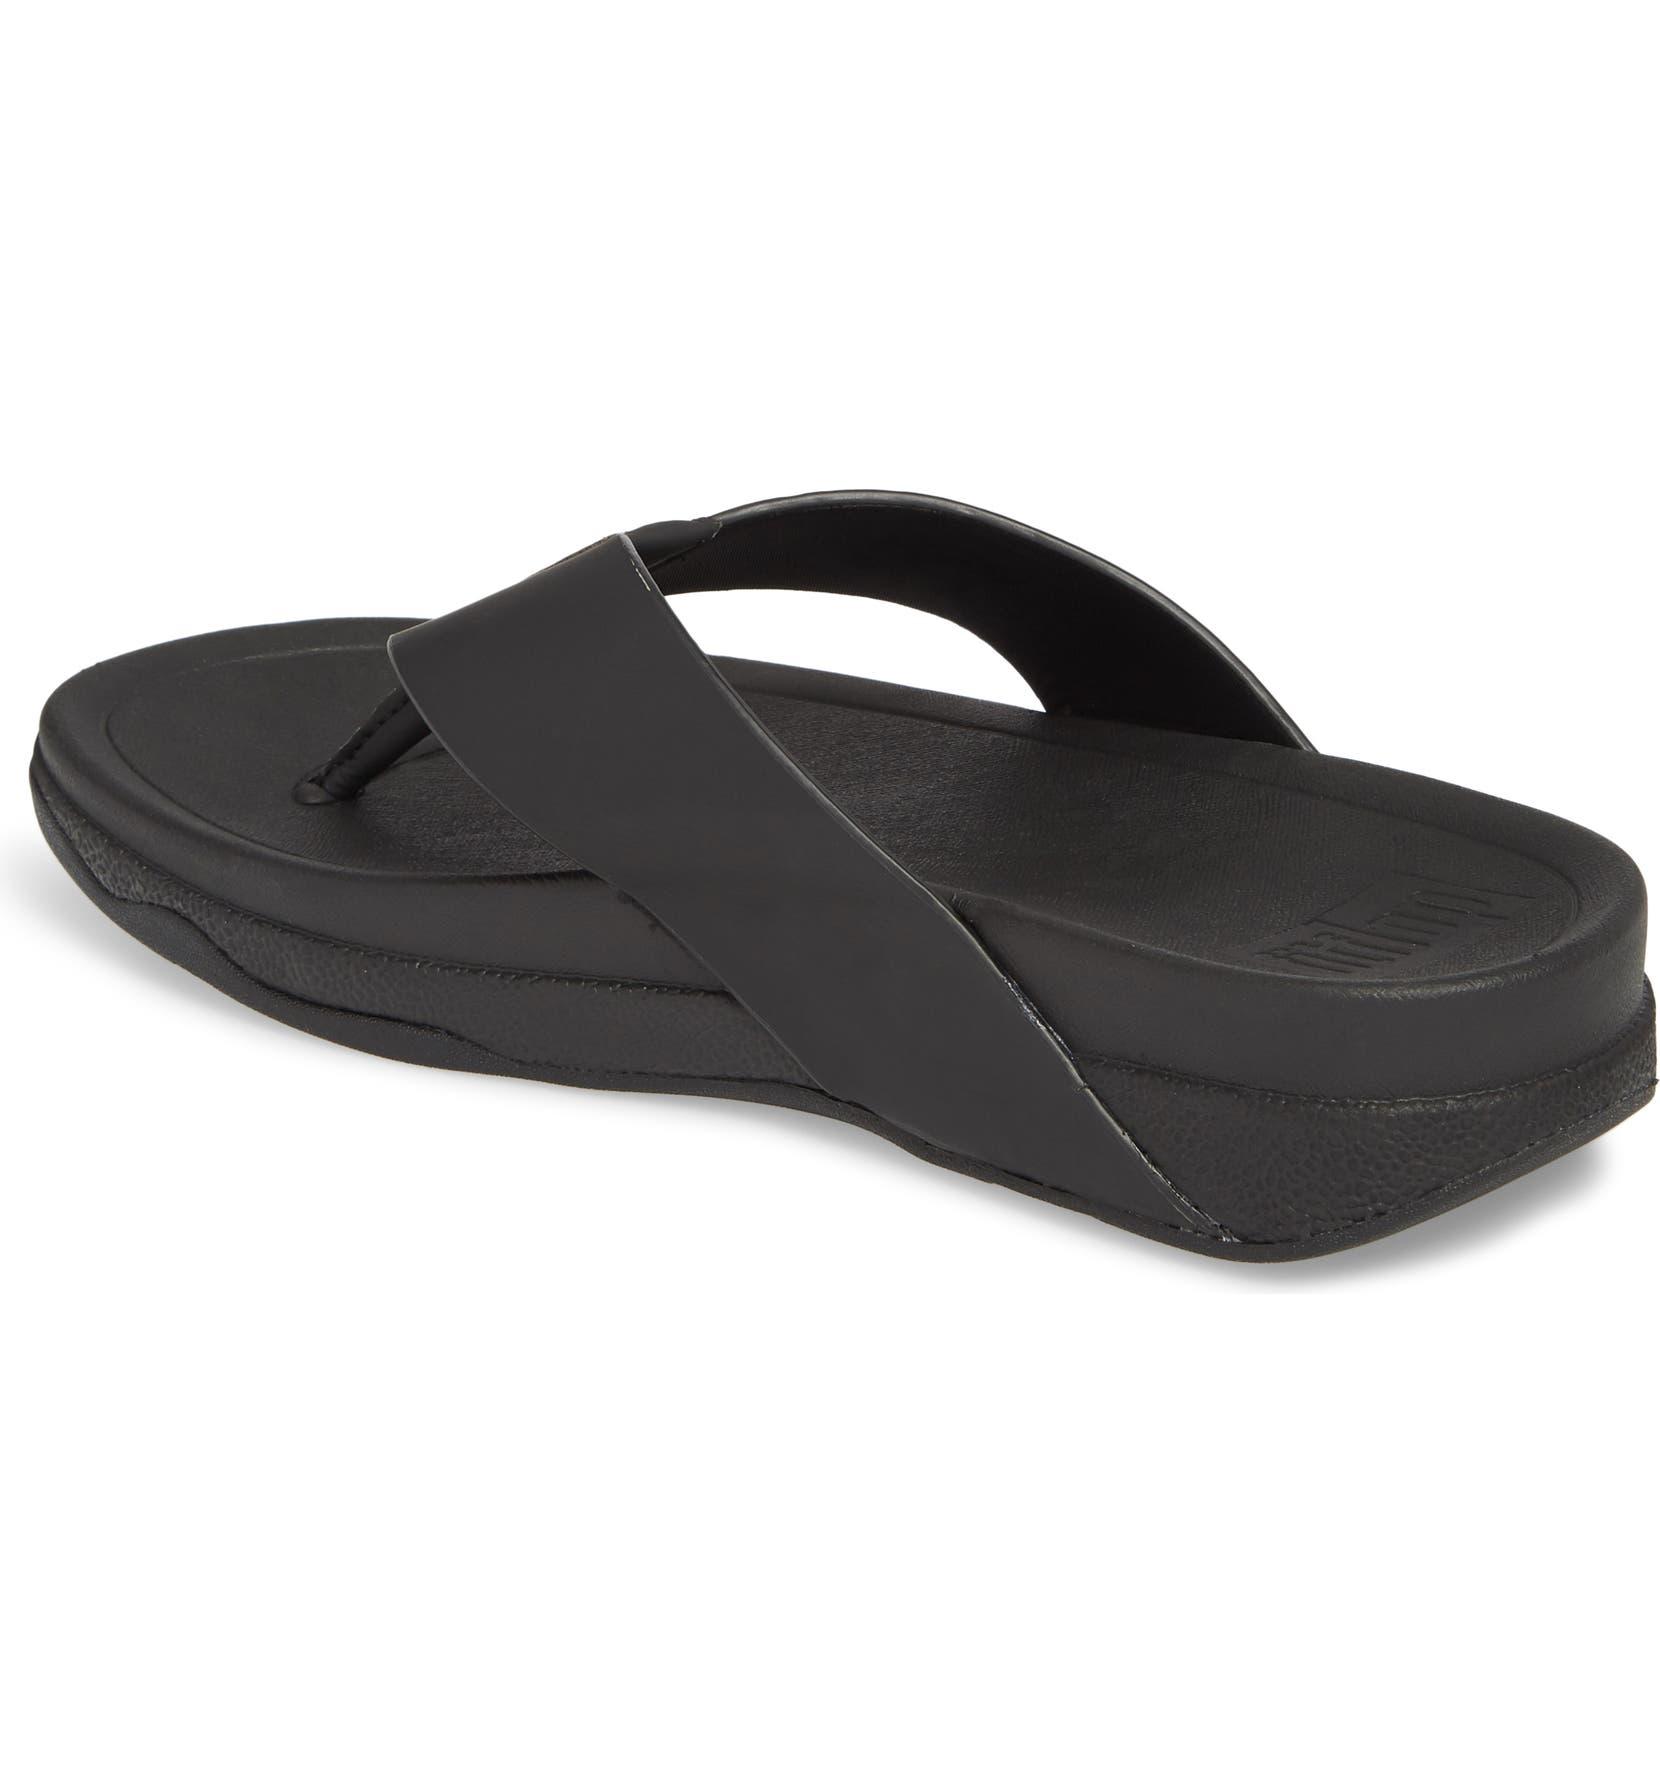 6811c8435f19a9 Surfer Toe Flip Flop